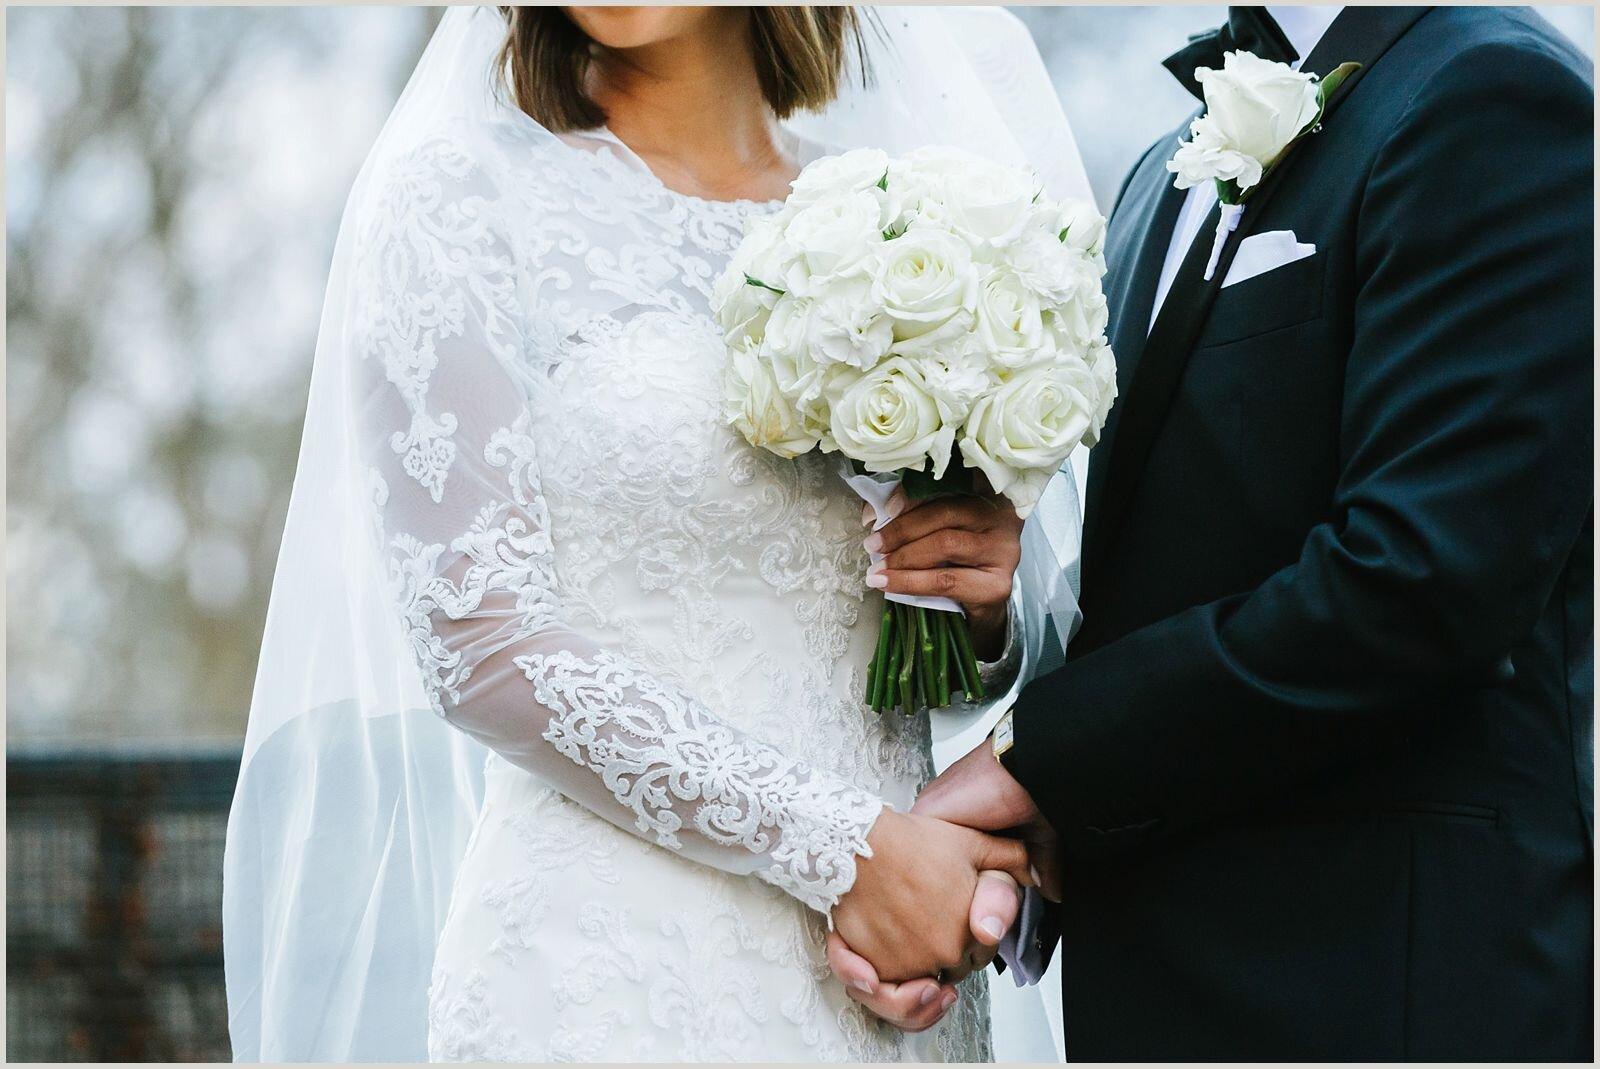 joseph_koprek_wedding_melbourne_the_prince_deck_0053.jpg